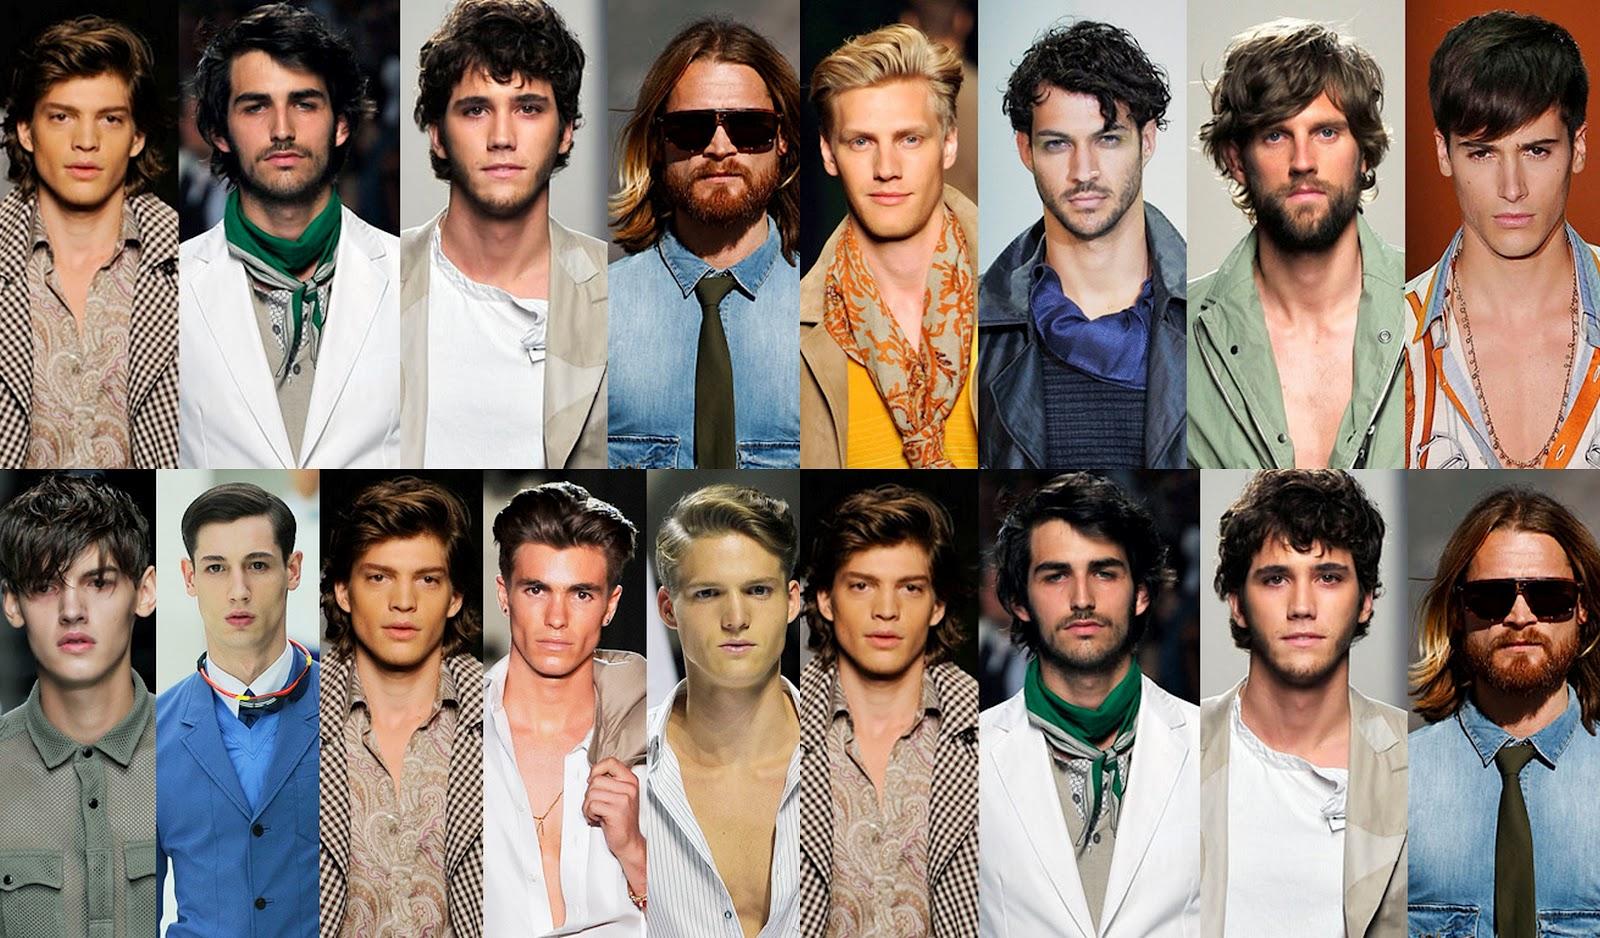 Peinados de hombre con algo de estilo - Peinados d hombre ...